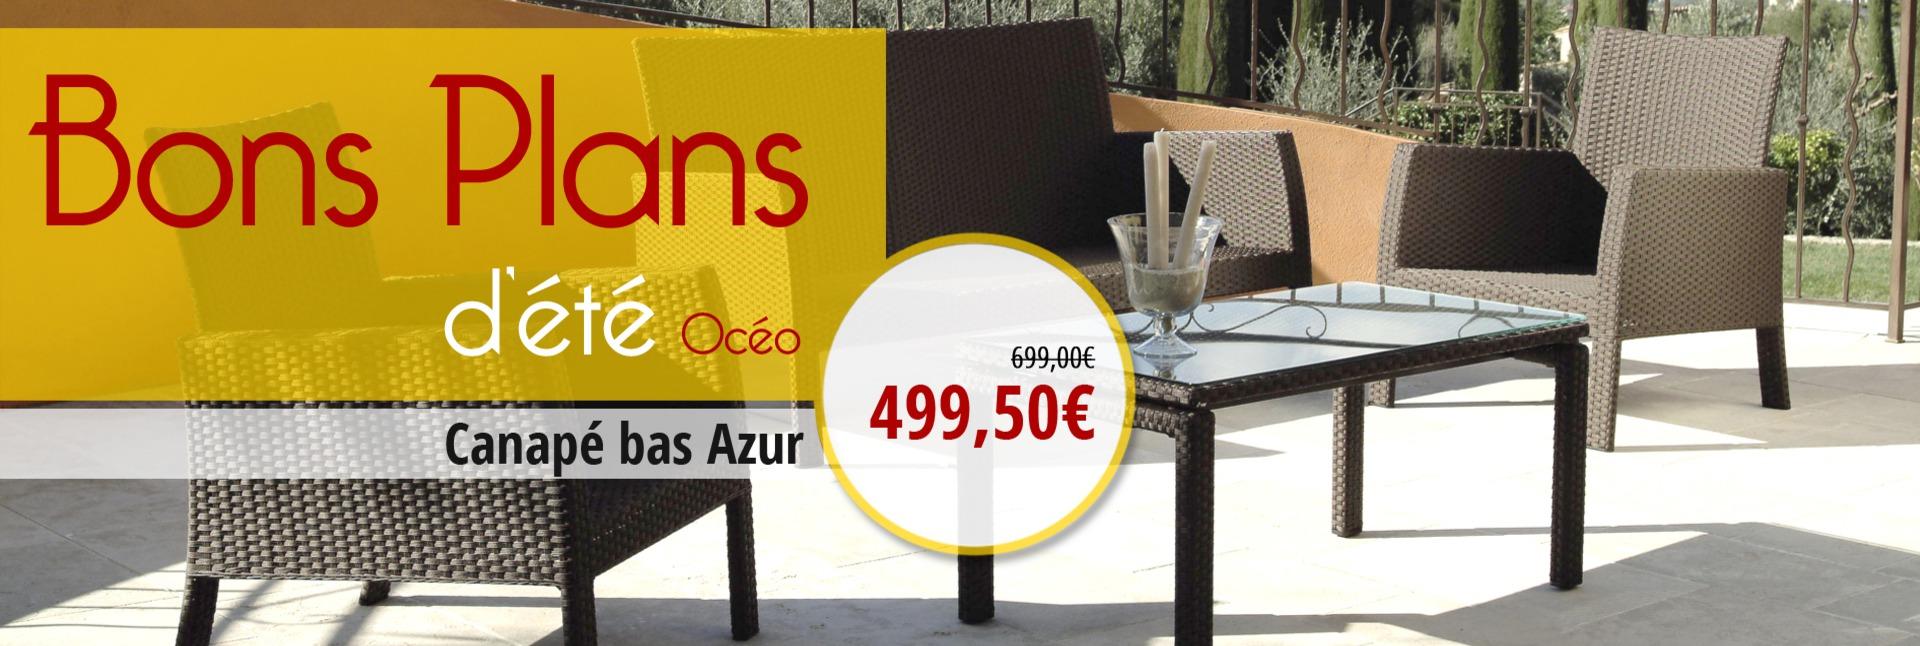 Canapé bas Azur